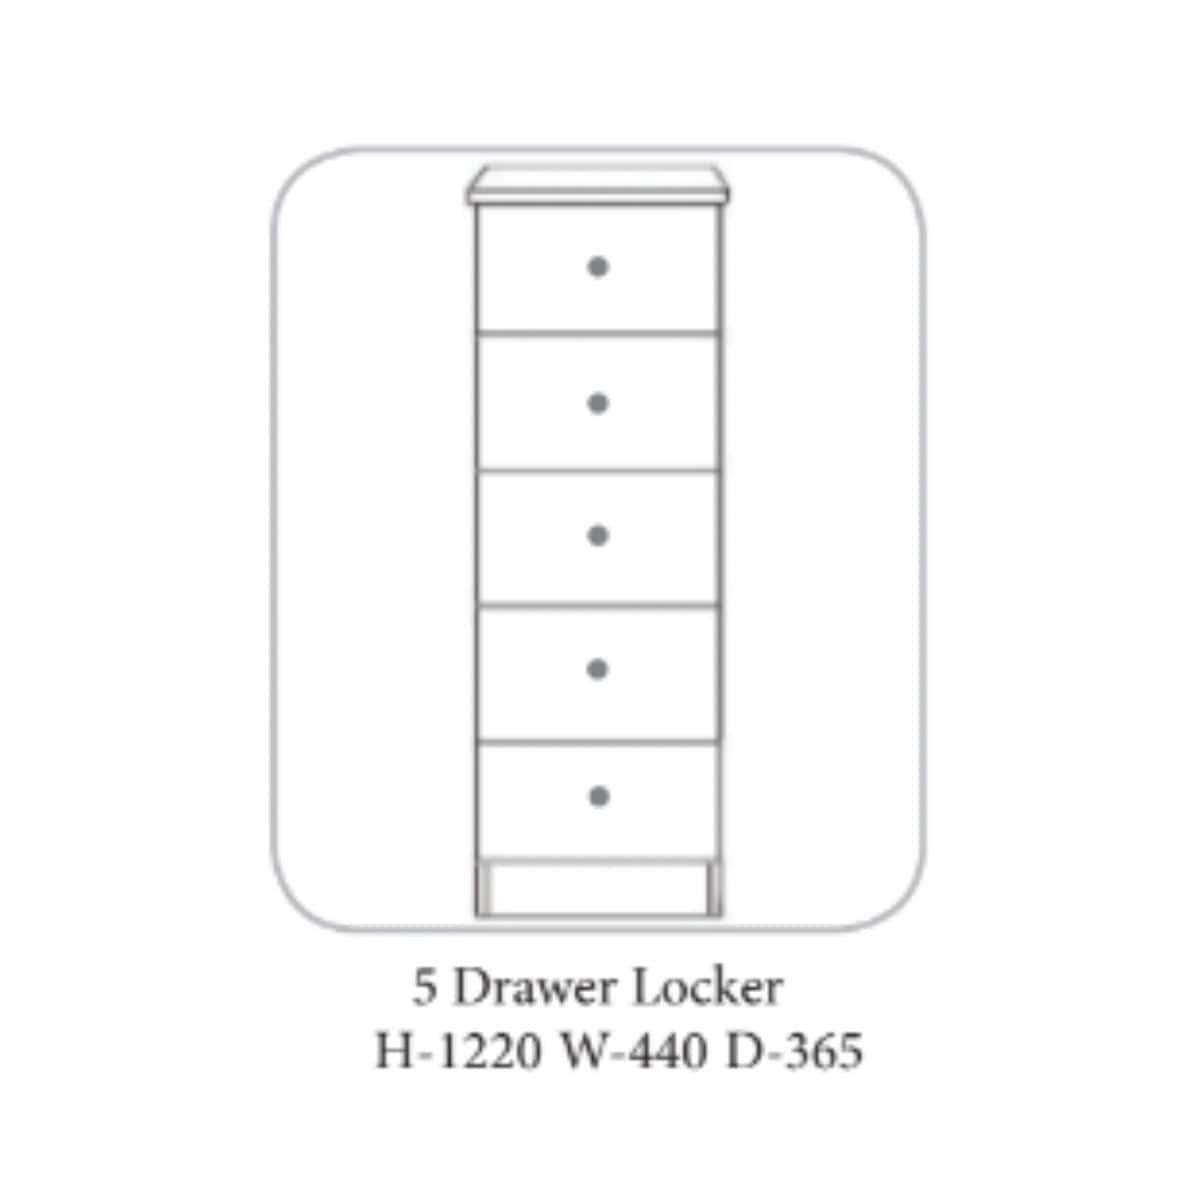 Lee Locker Walnut & Ivory - 4 Options